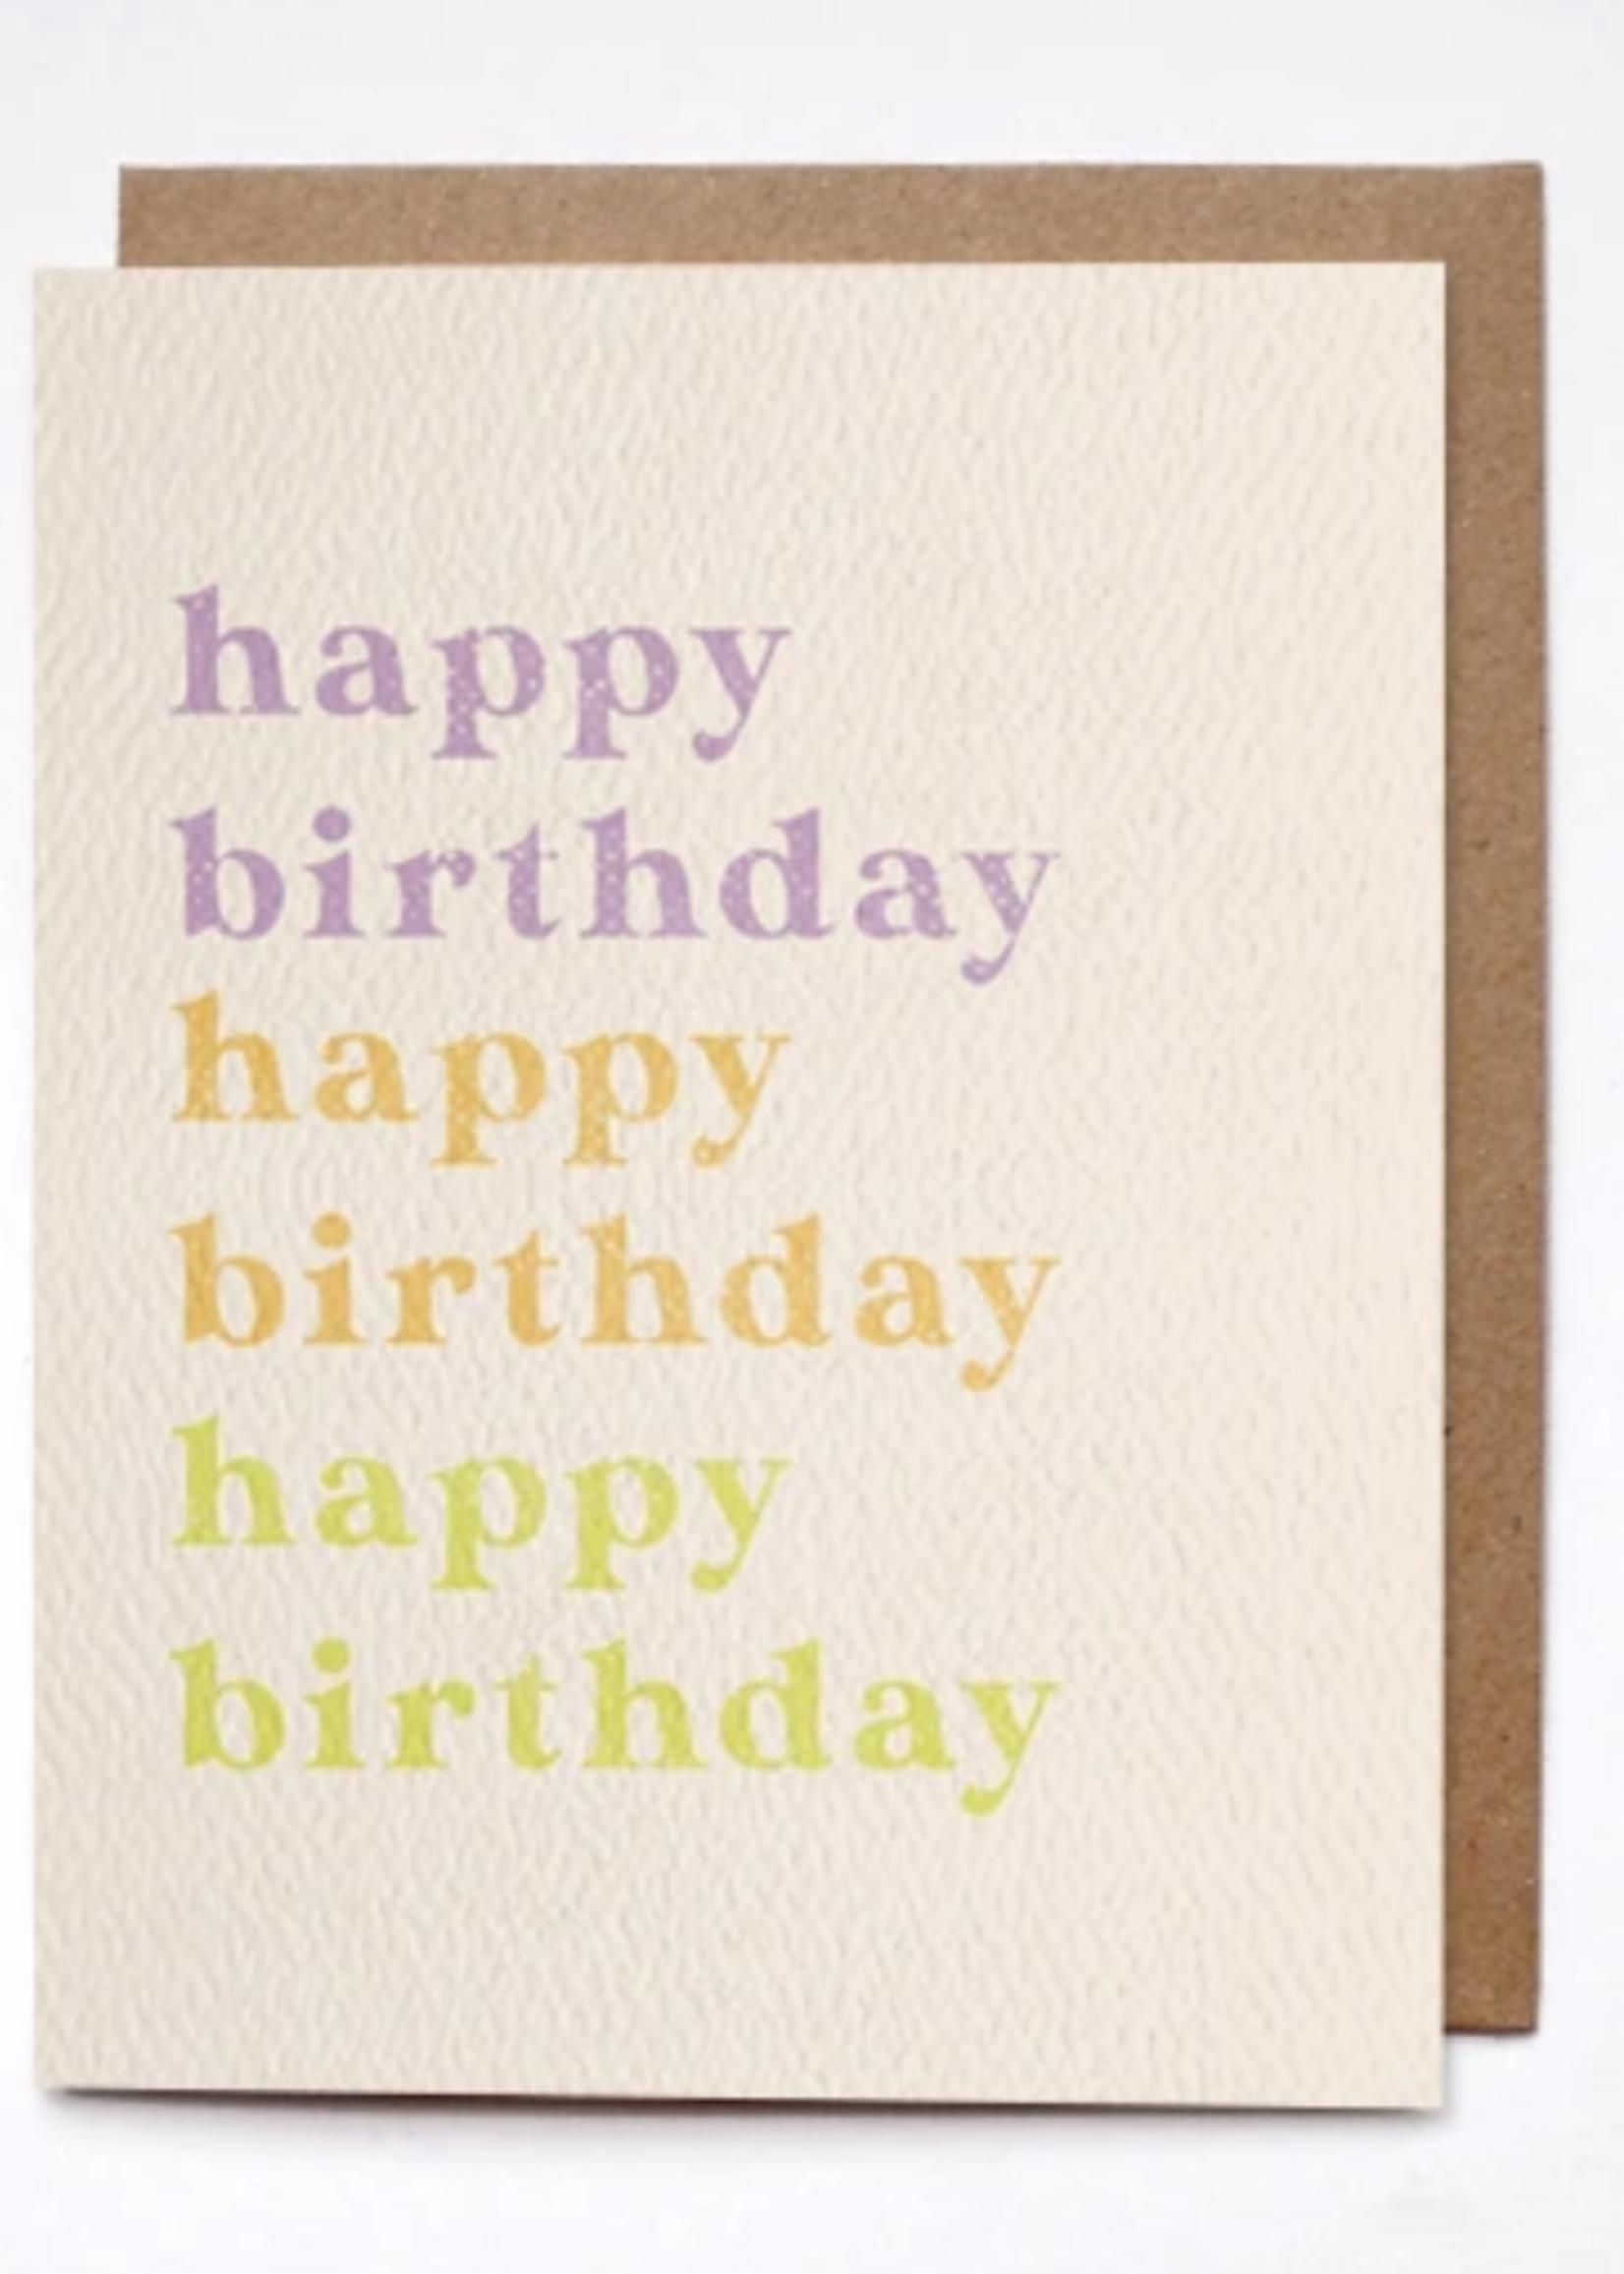 daydream prints happy birthday colorful card